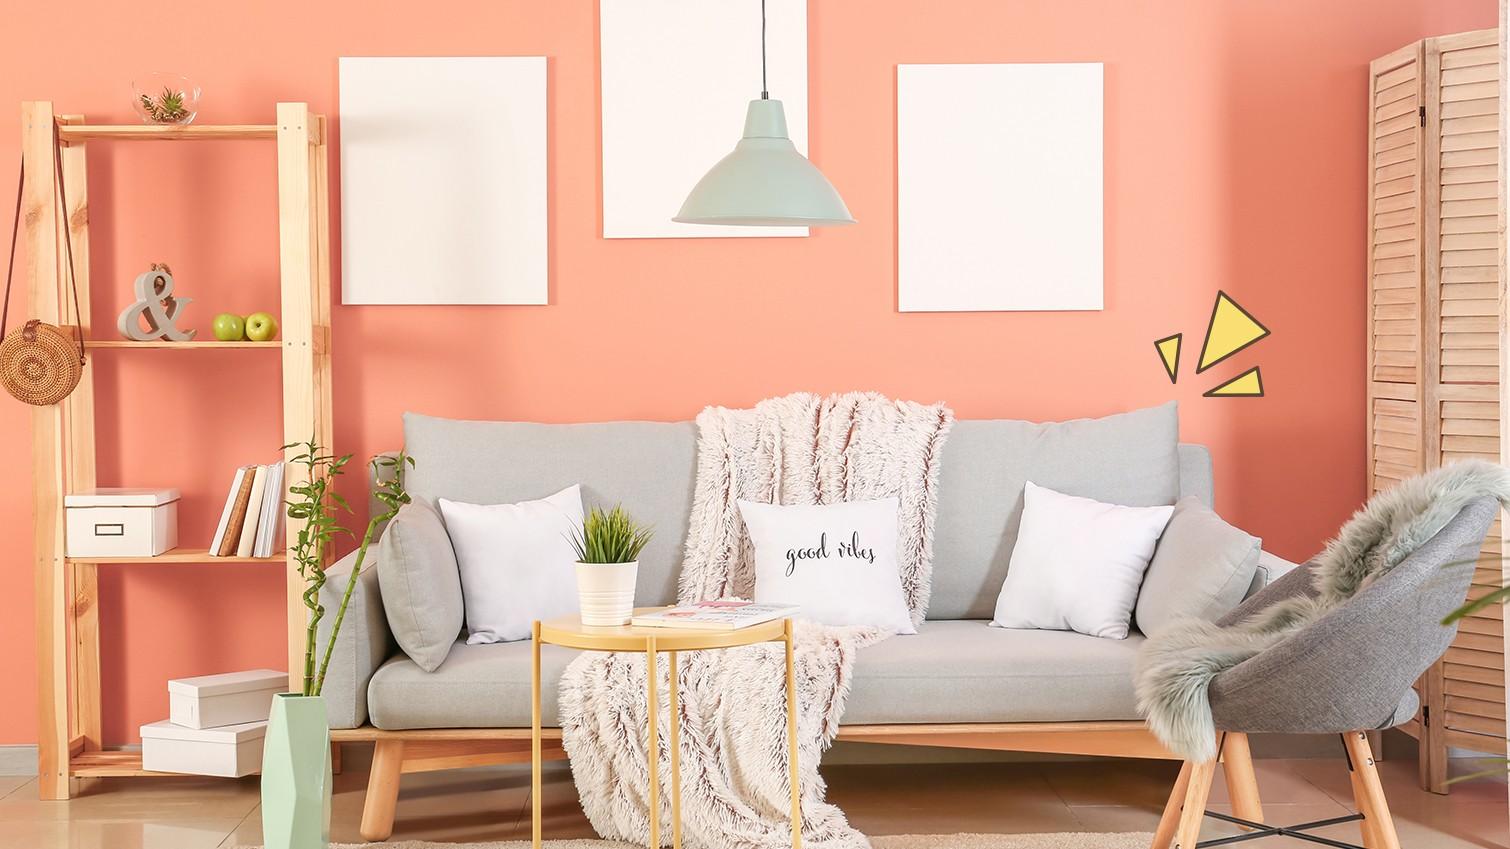 Inspirasi Cat  Dinding Bikin  Rumah  Adem  property145